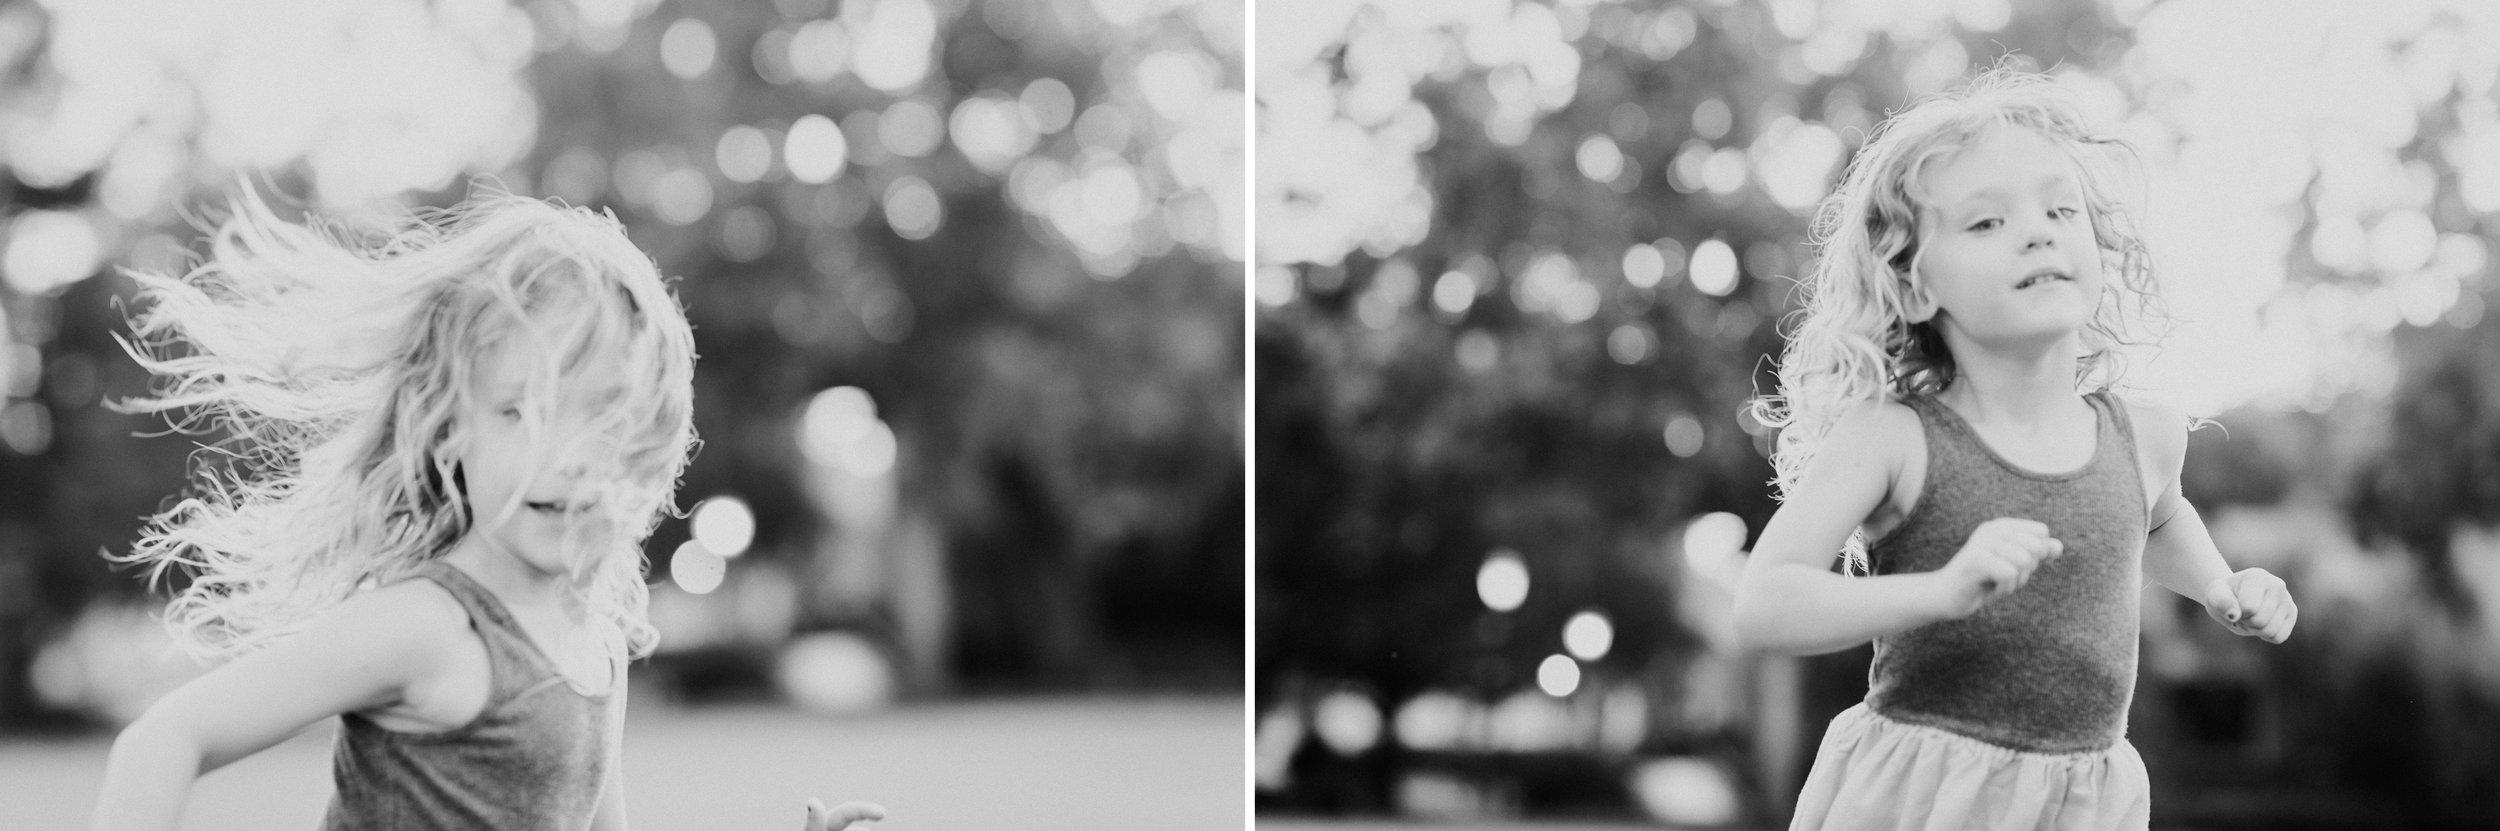 KateTaramykinStudios-Winter-Park-Family-Portraits-CA-17.jpg